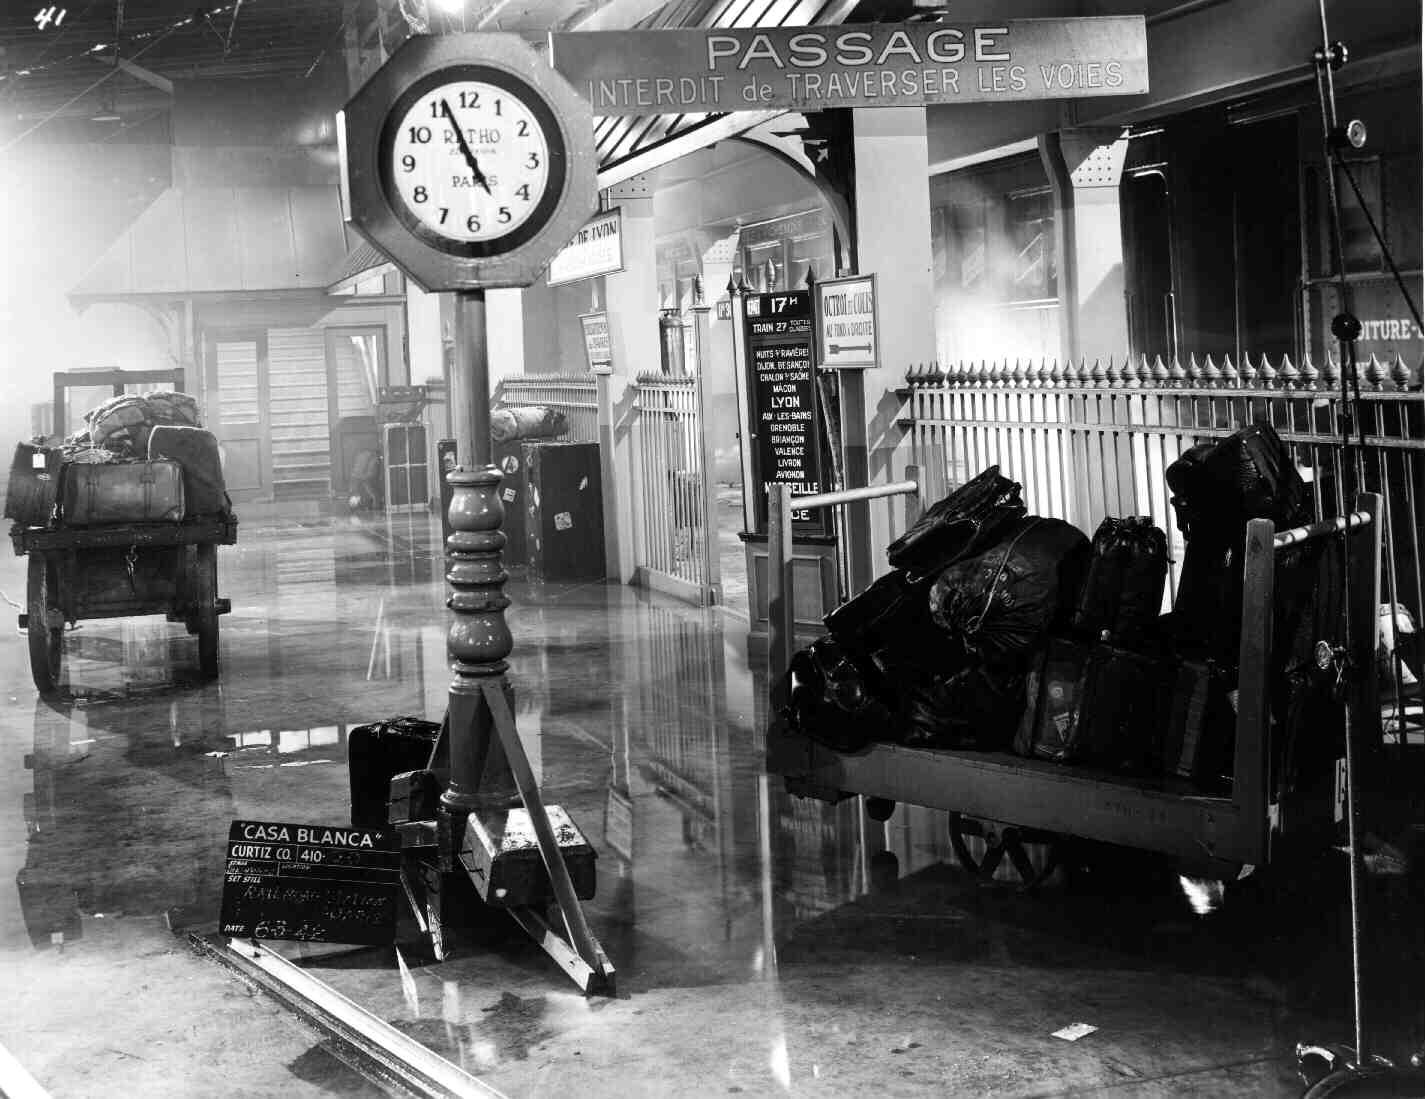 Casablanca Behind The Scenes Keith Amp The Movies